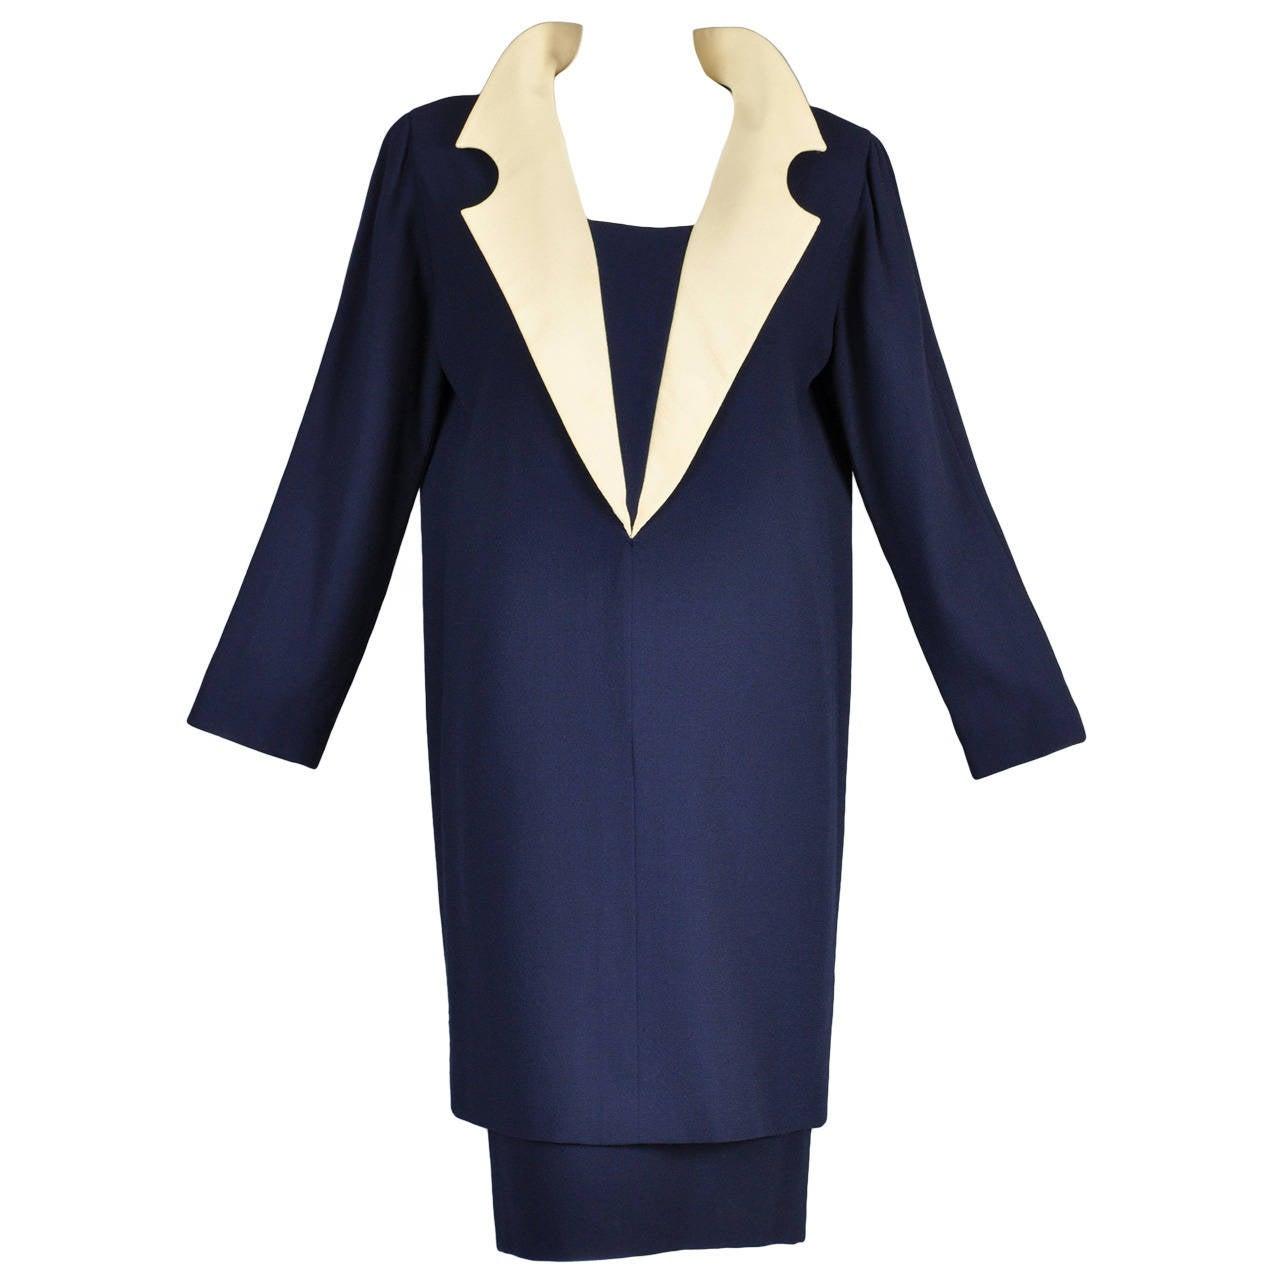 C 1992 pierre cardin haute couture skirt plus tunic shift for Haute couture clothing